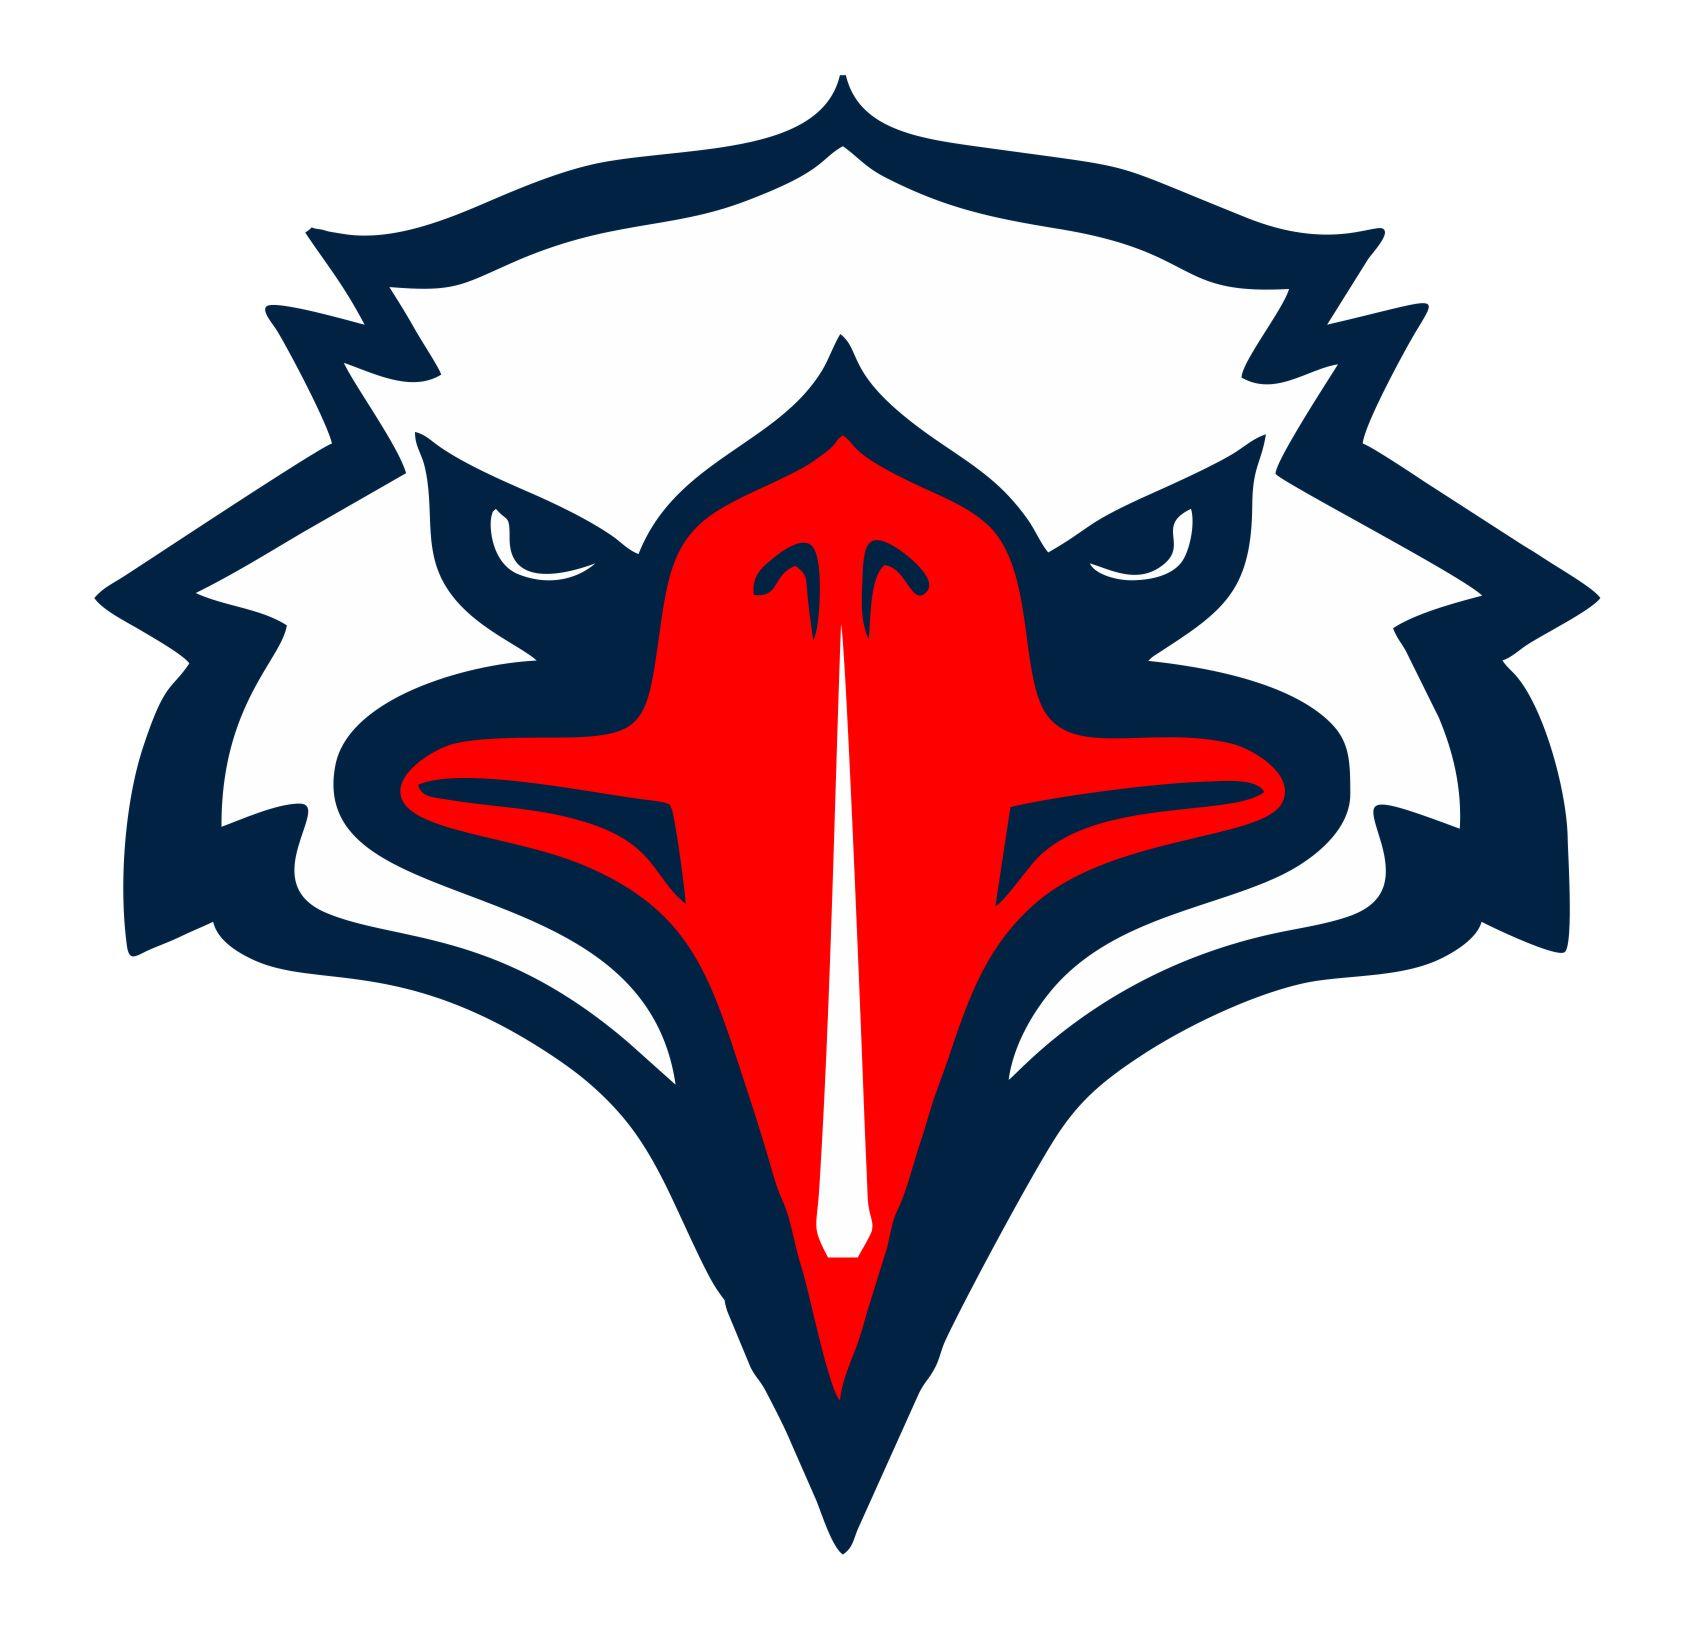 Logo with Eagle Head